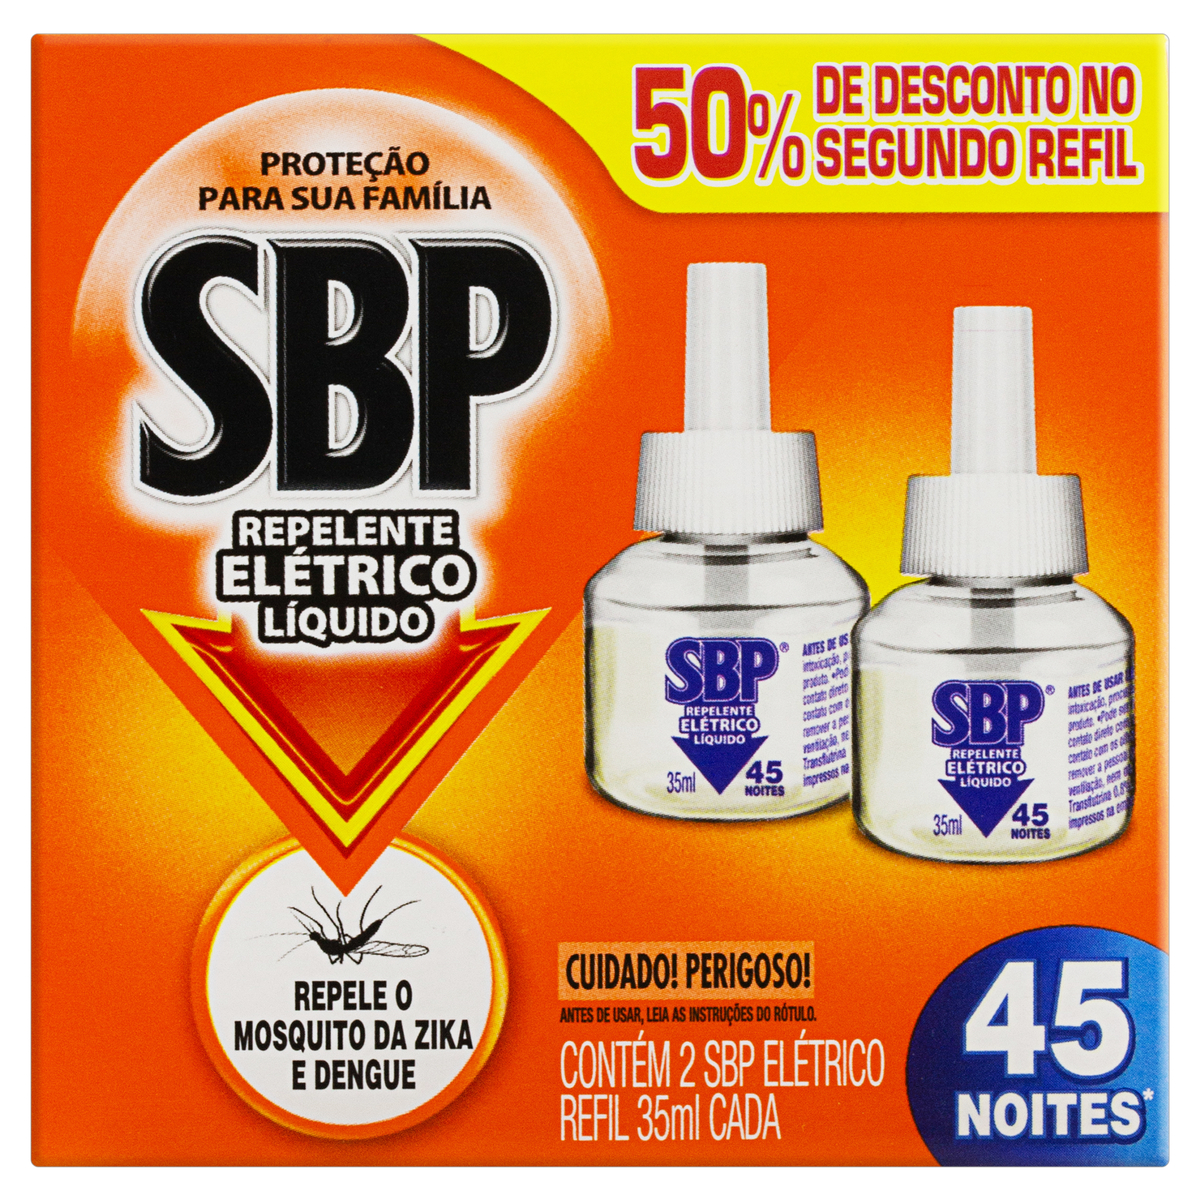 SBP PR LED RF LIQ 45N 50%OF 2X35ML(12)